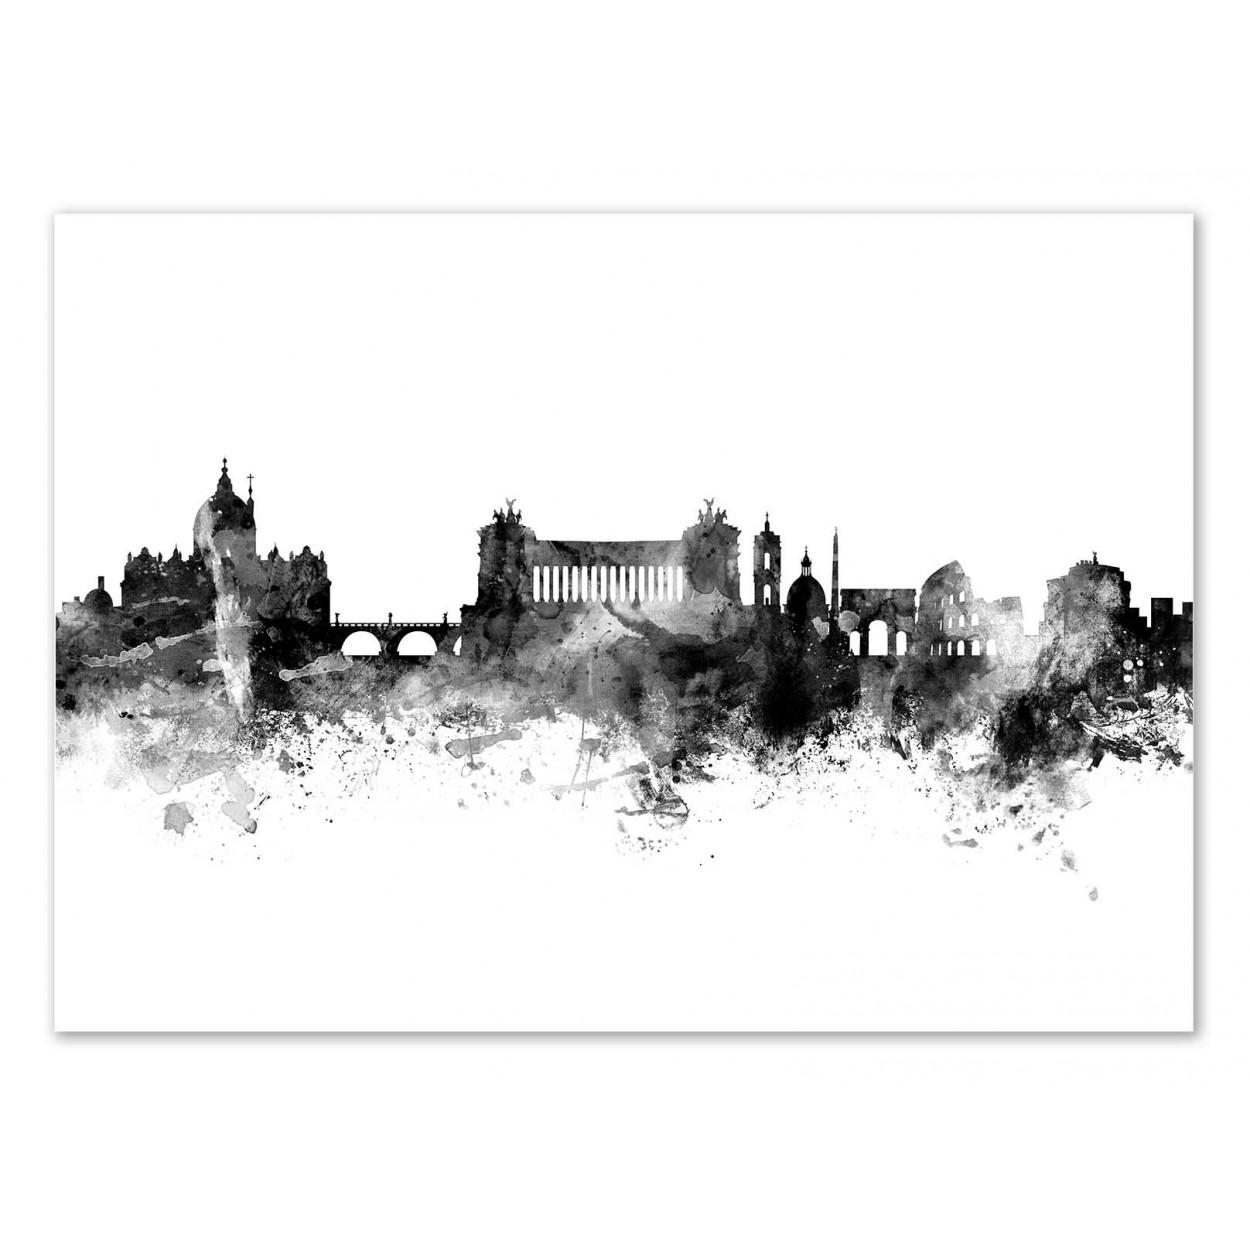 ROME ITALY SKYLINE - Affiche d'art 50 x 70 cm